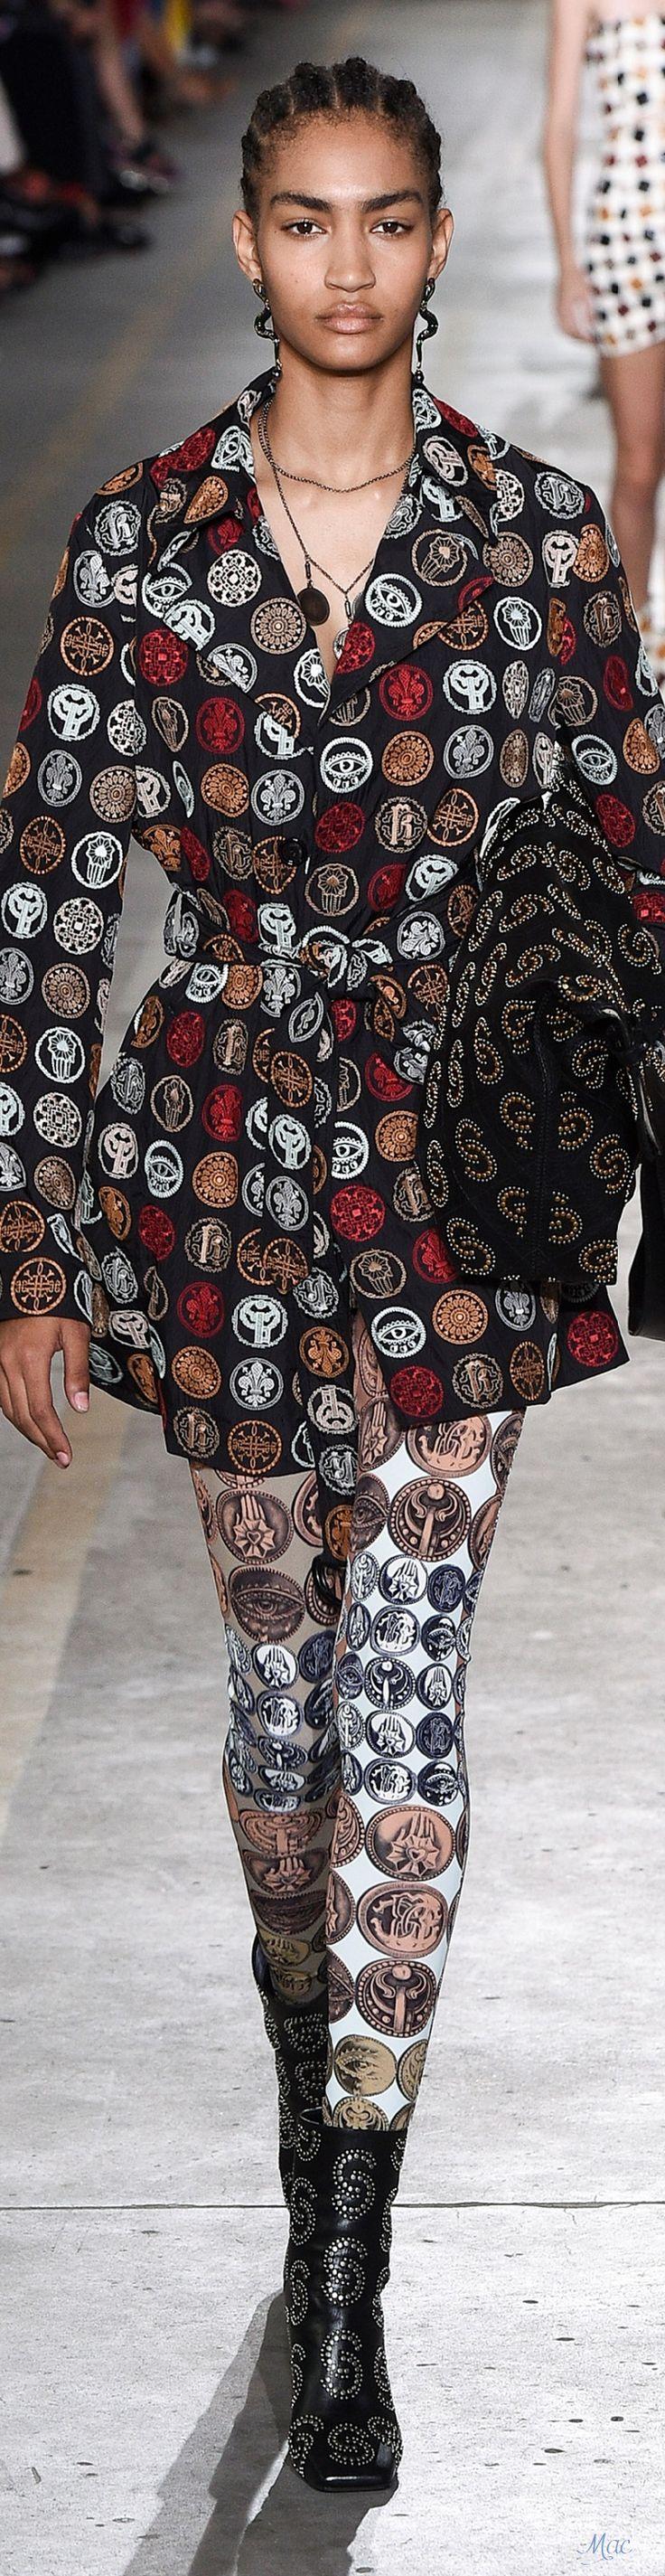 7c4990f0f94b09ae7e0aa30bb9aae771 Roberto Cavalli Couture  : Printemps 2019 RTW Roberto Cavalli